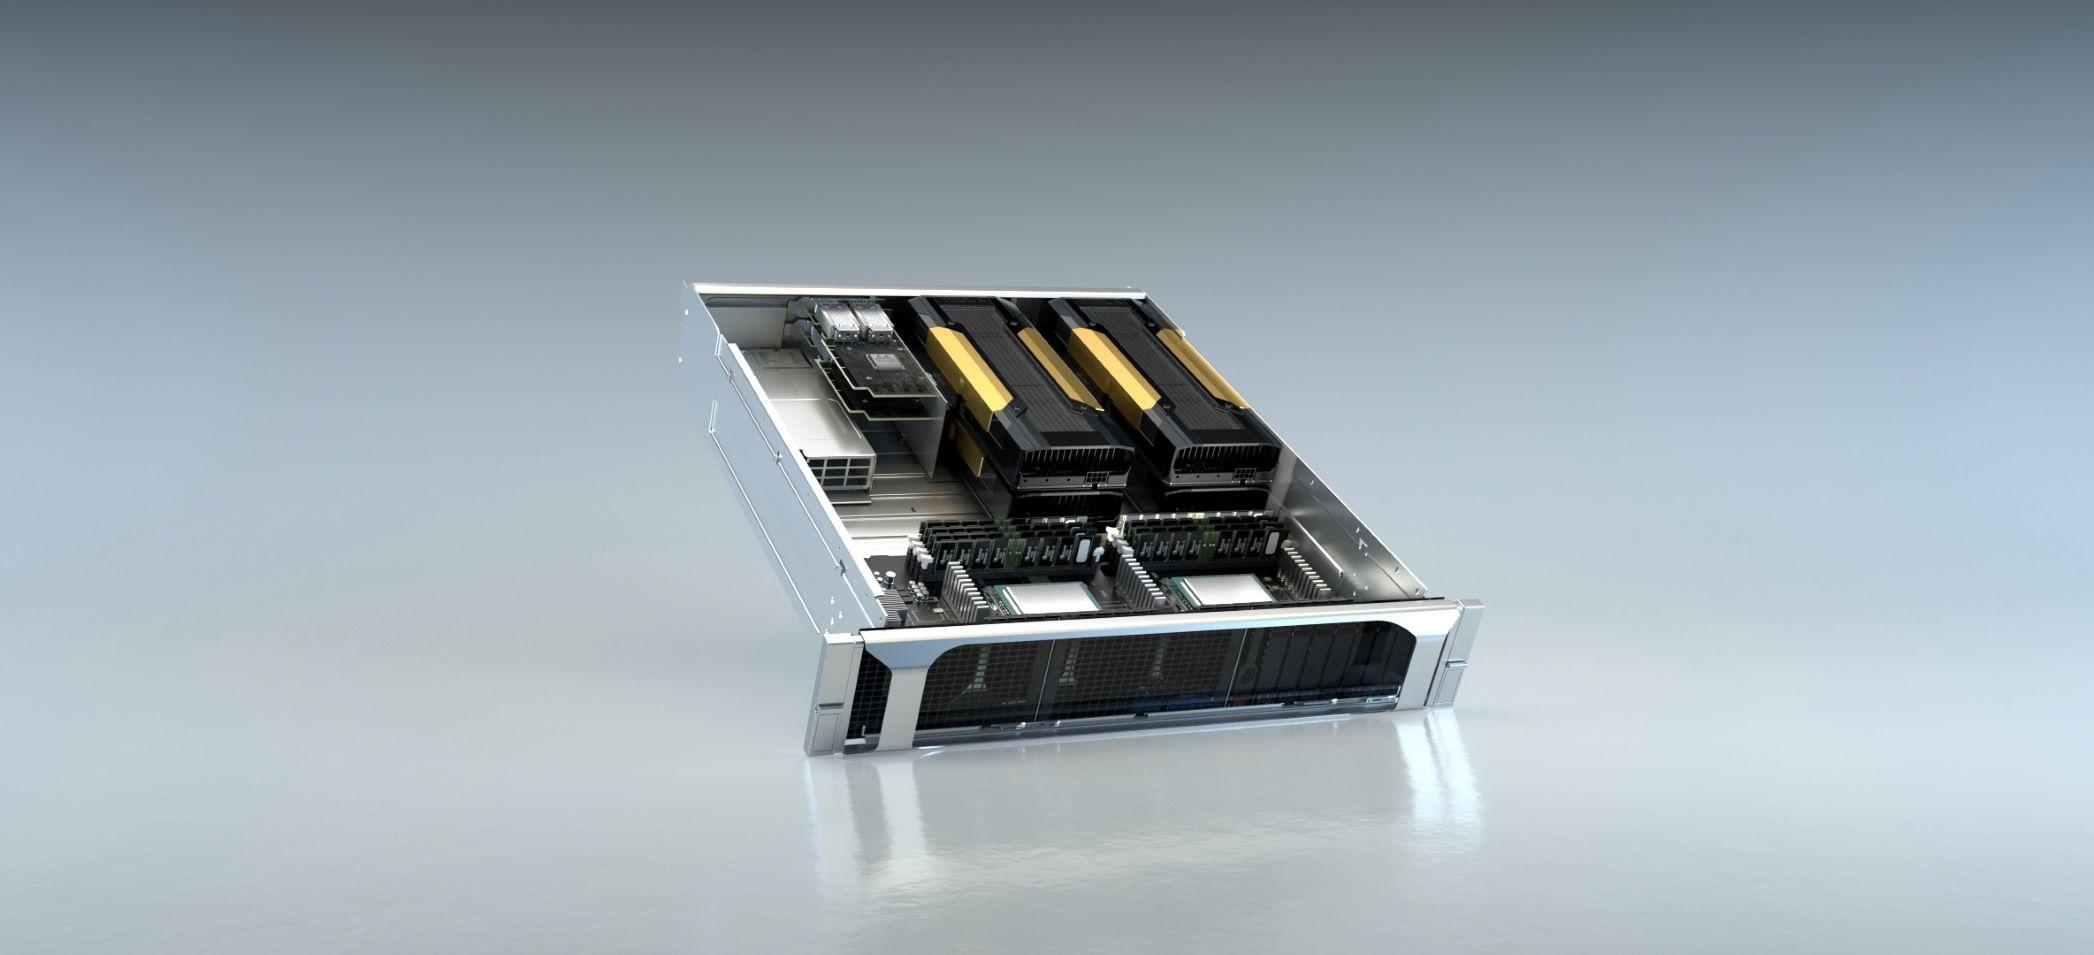 nvidia-egx-edge-supercomputing